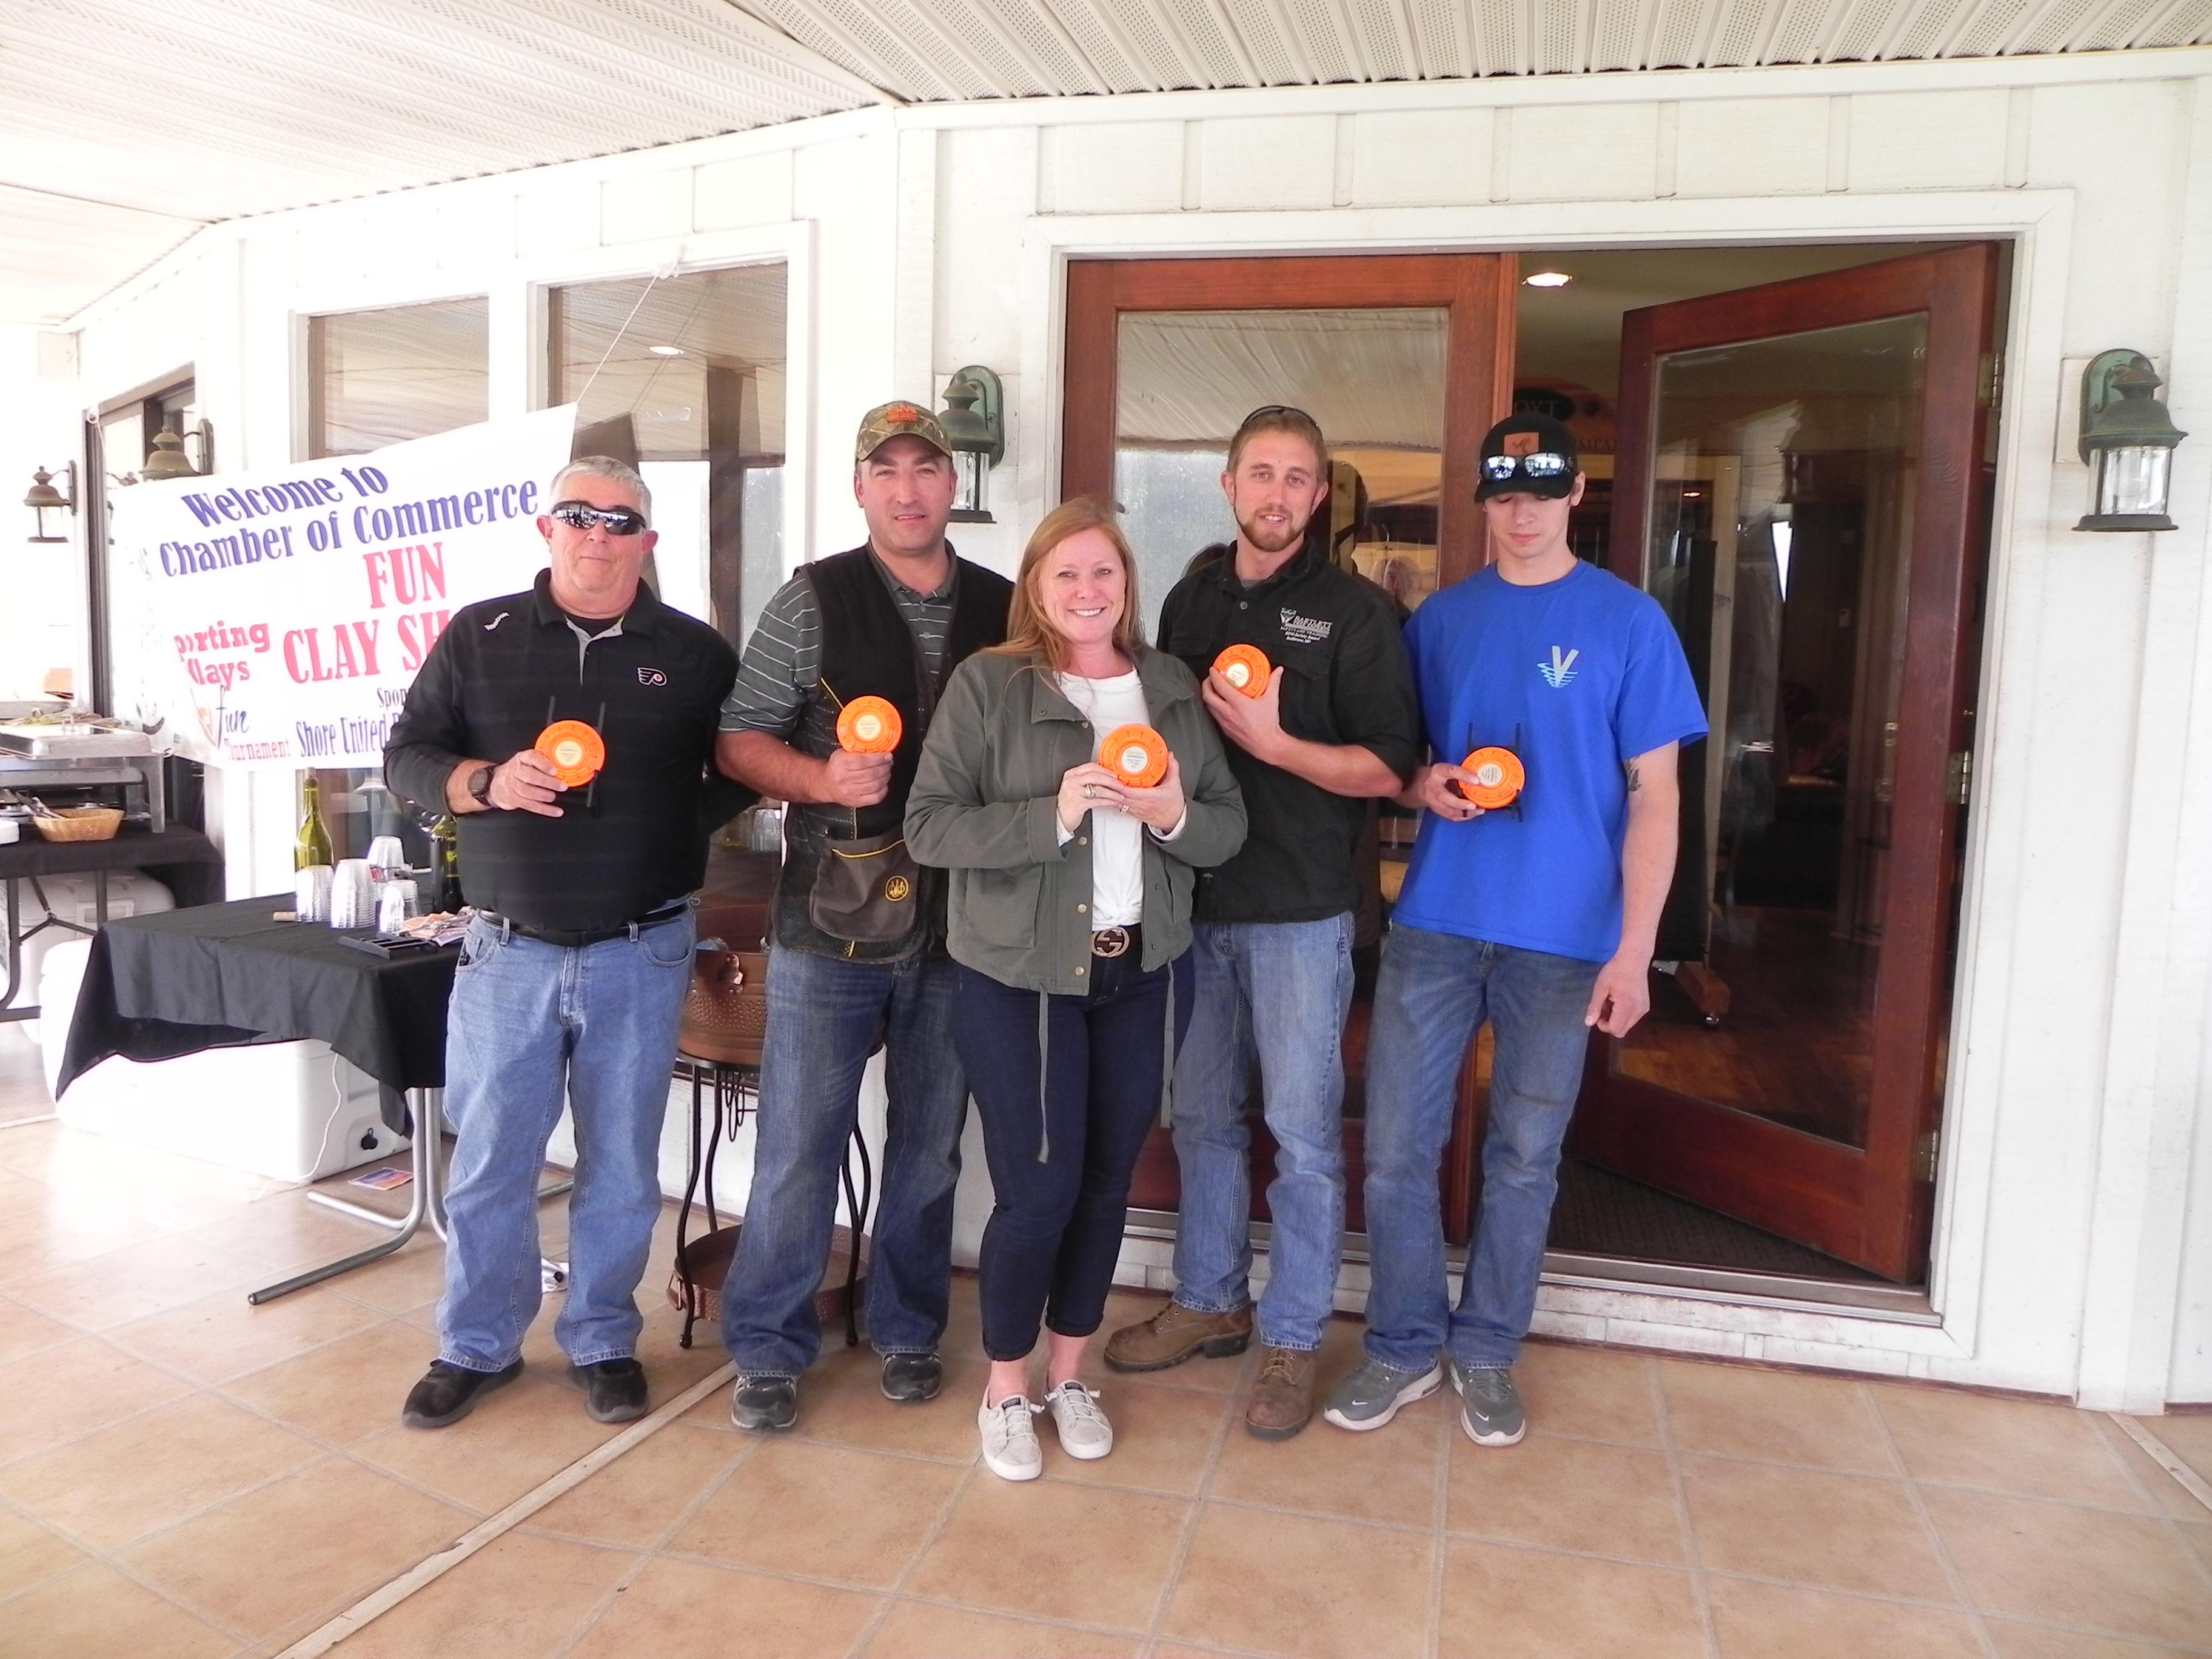 Winners of the 1st QAC Chamber Fun Clay Shoot